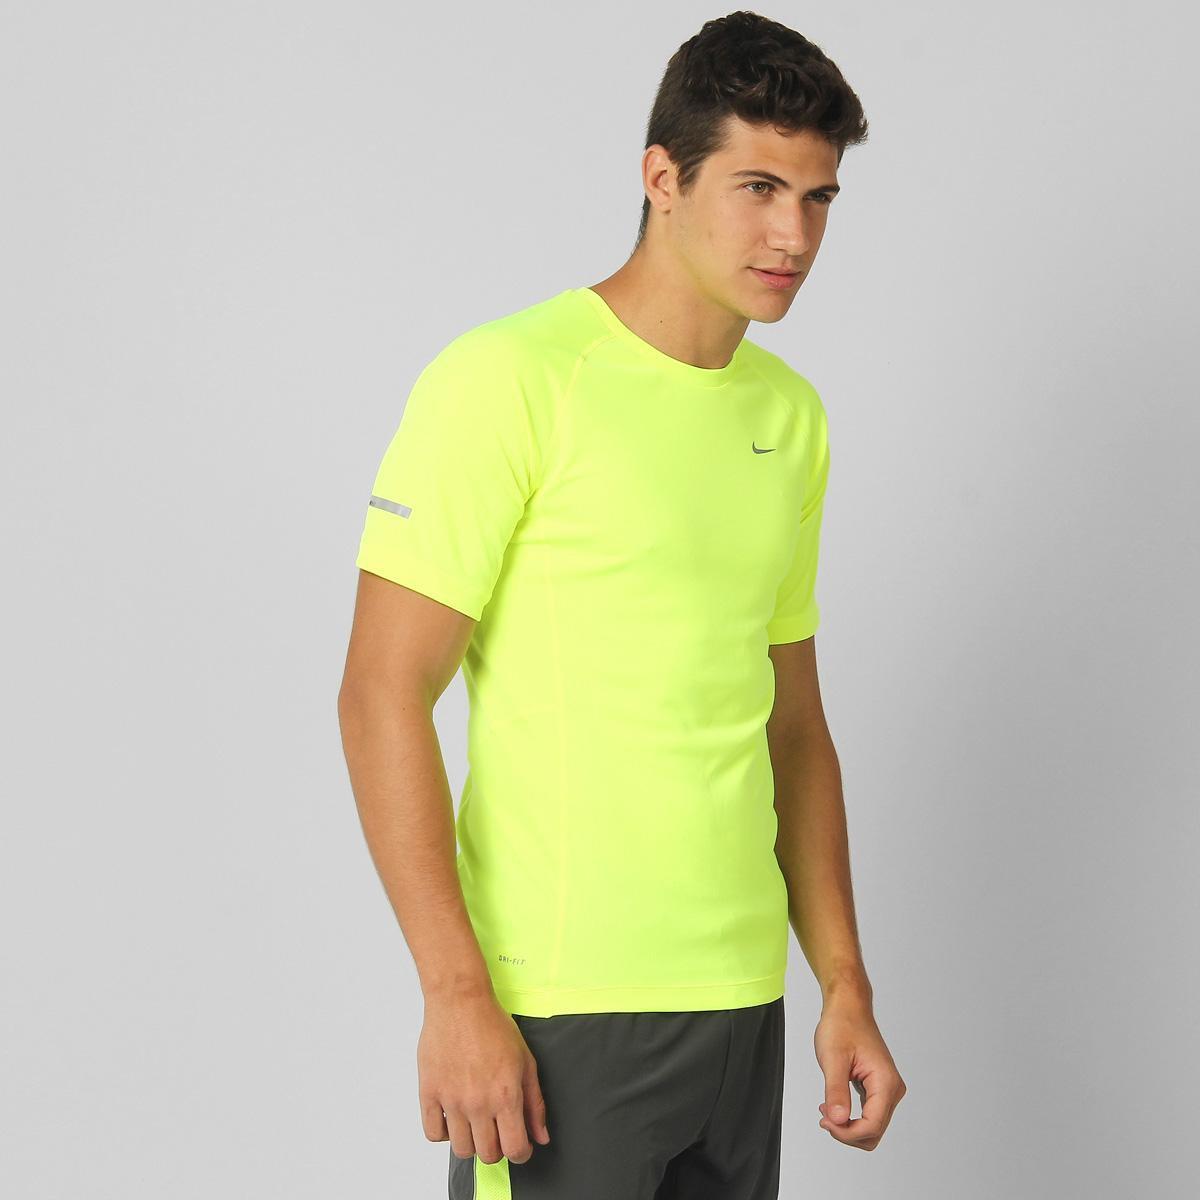 c9e3a8168e76d Camiseta Nike Miler - Compre Agora